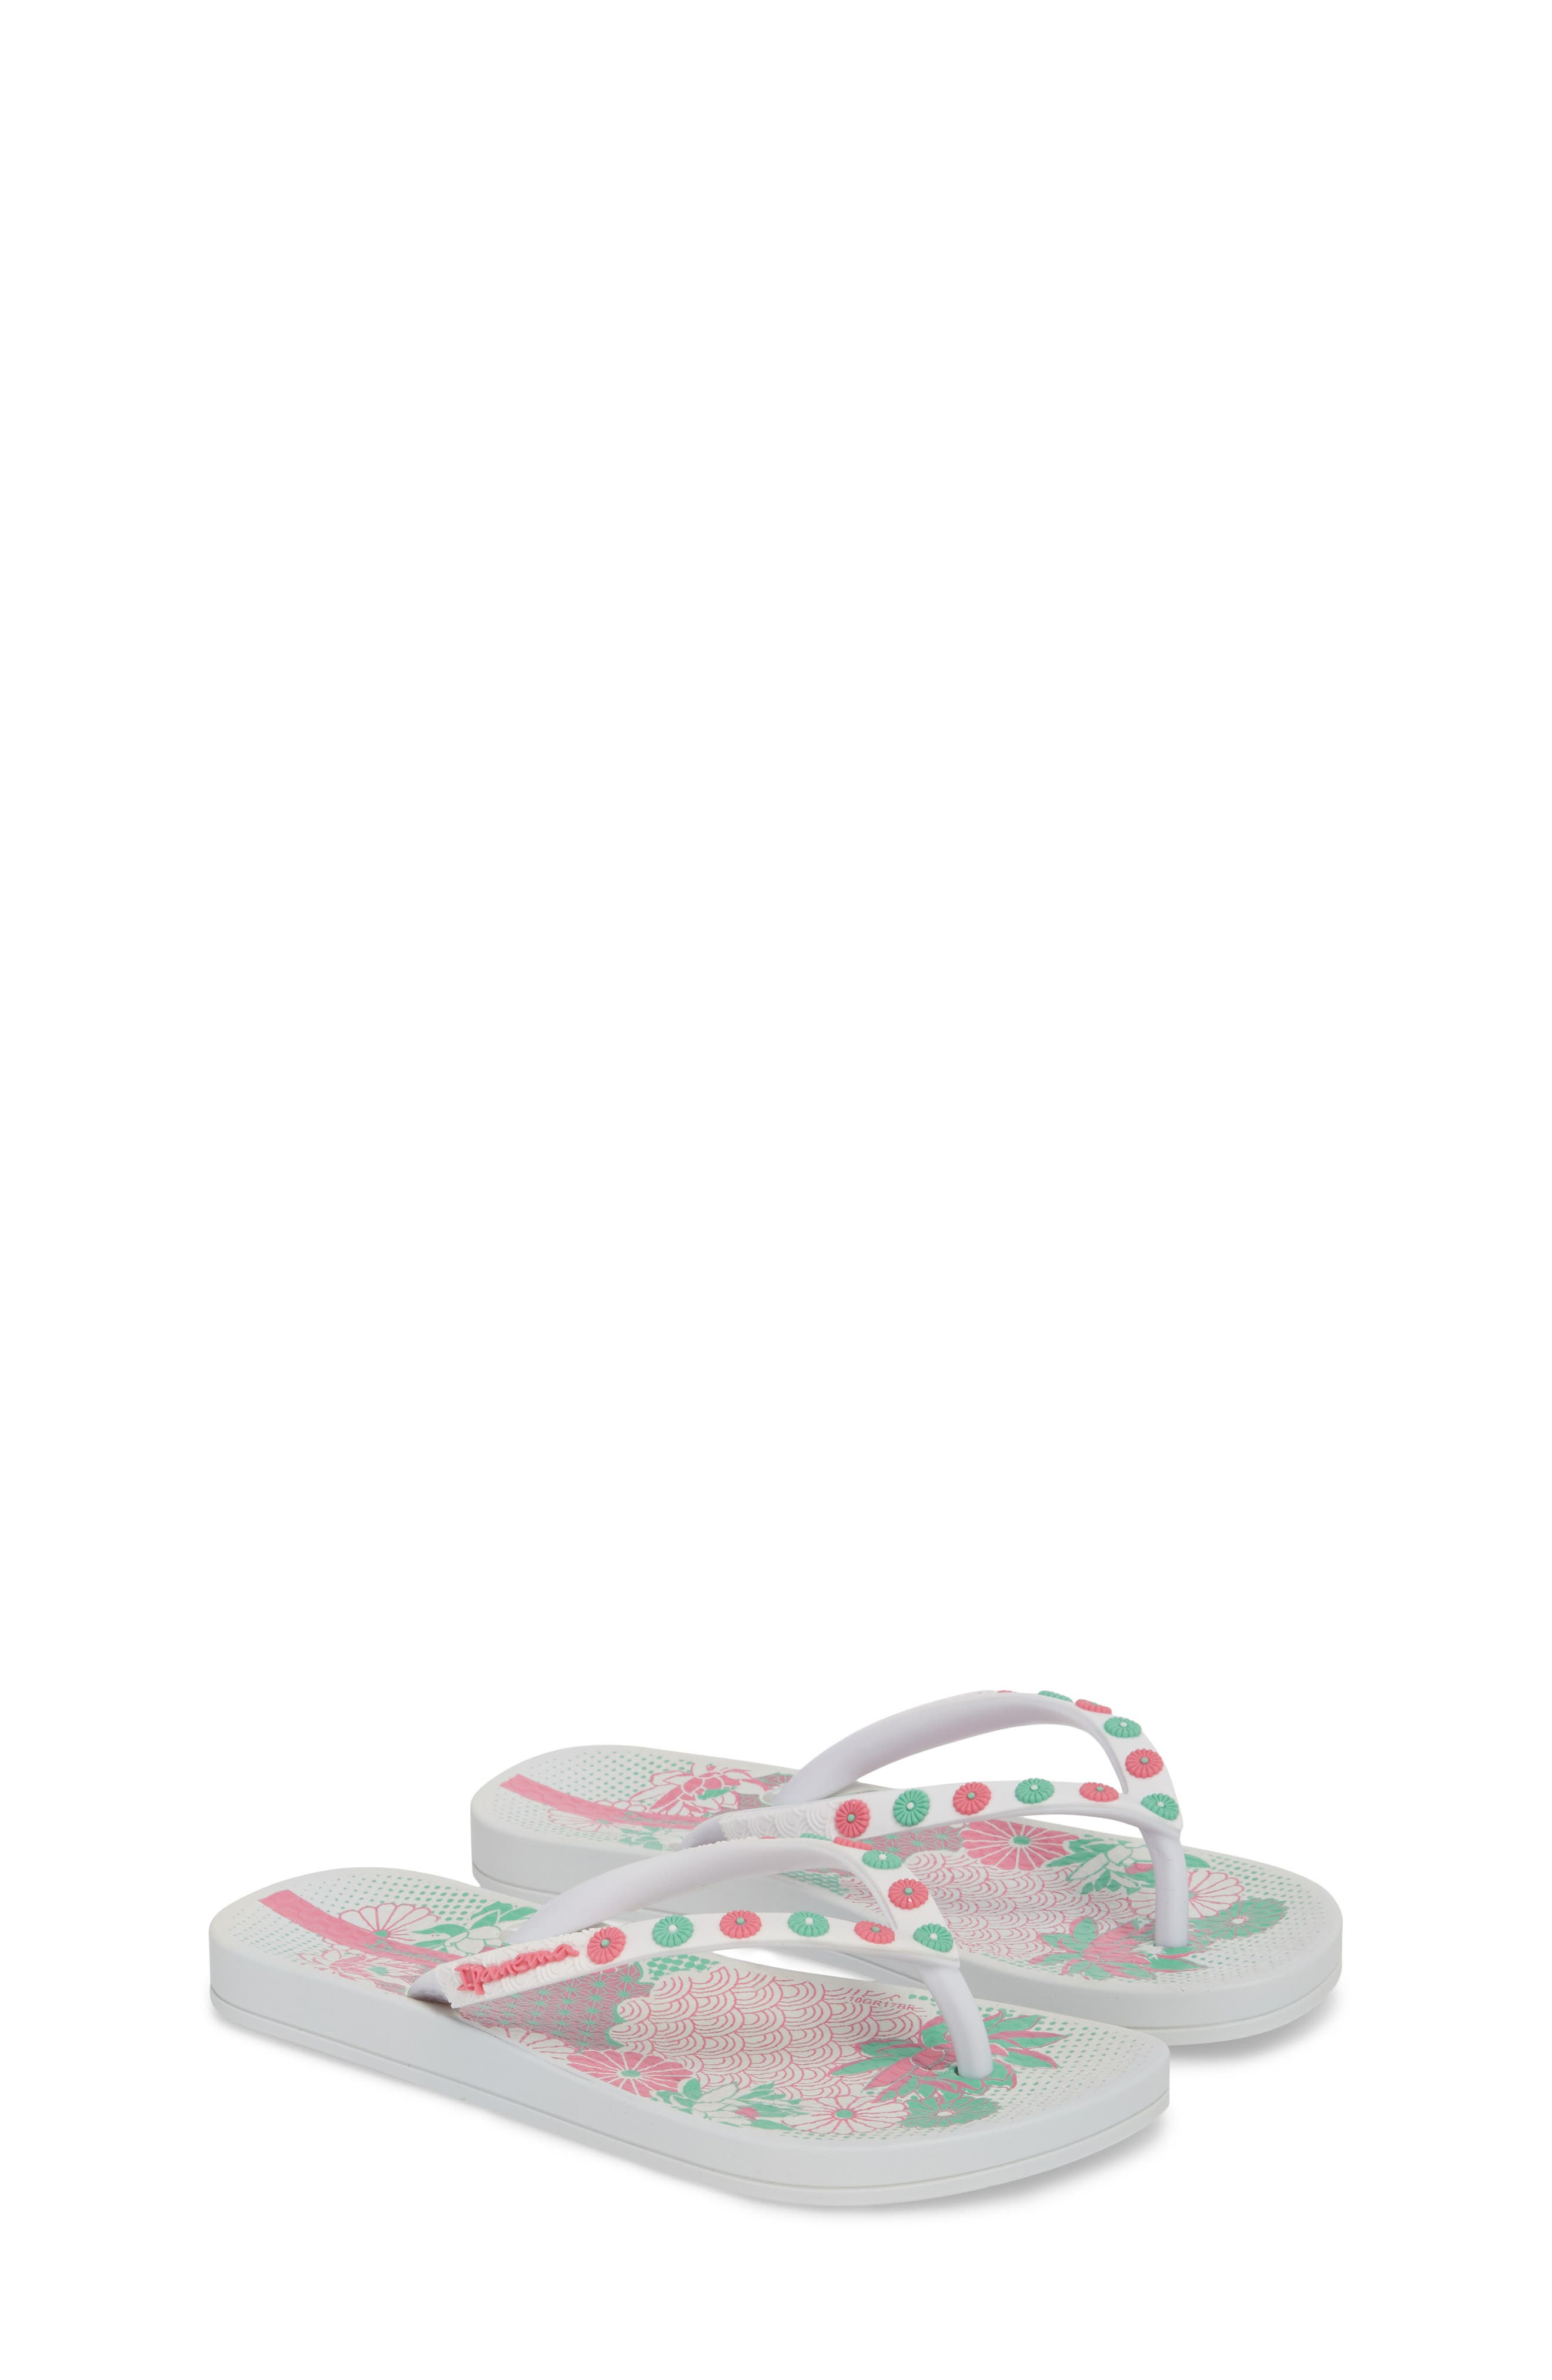 Ana Lovely Flip Flop,                             Alternate thumbnail 3, color,